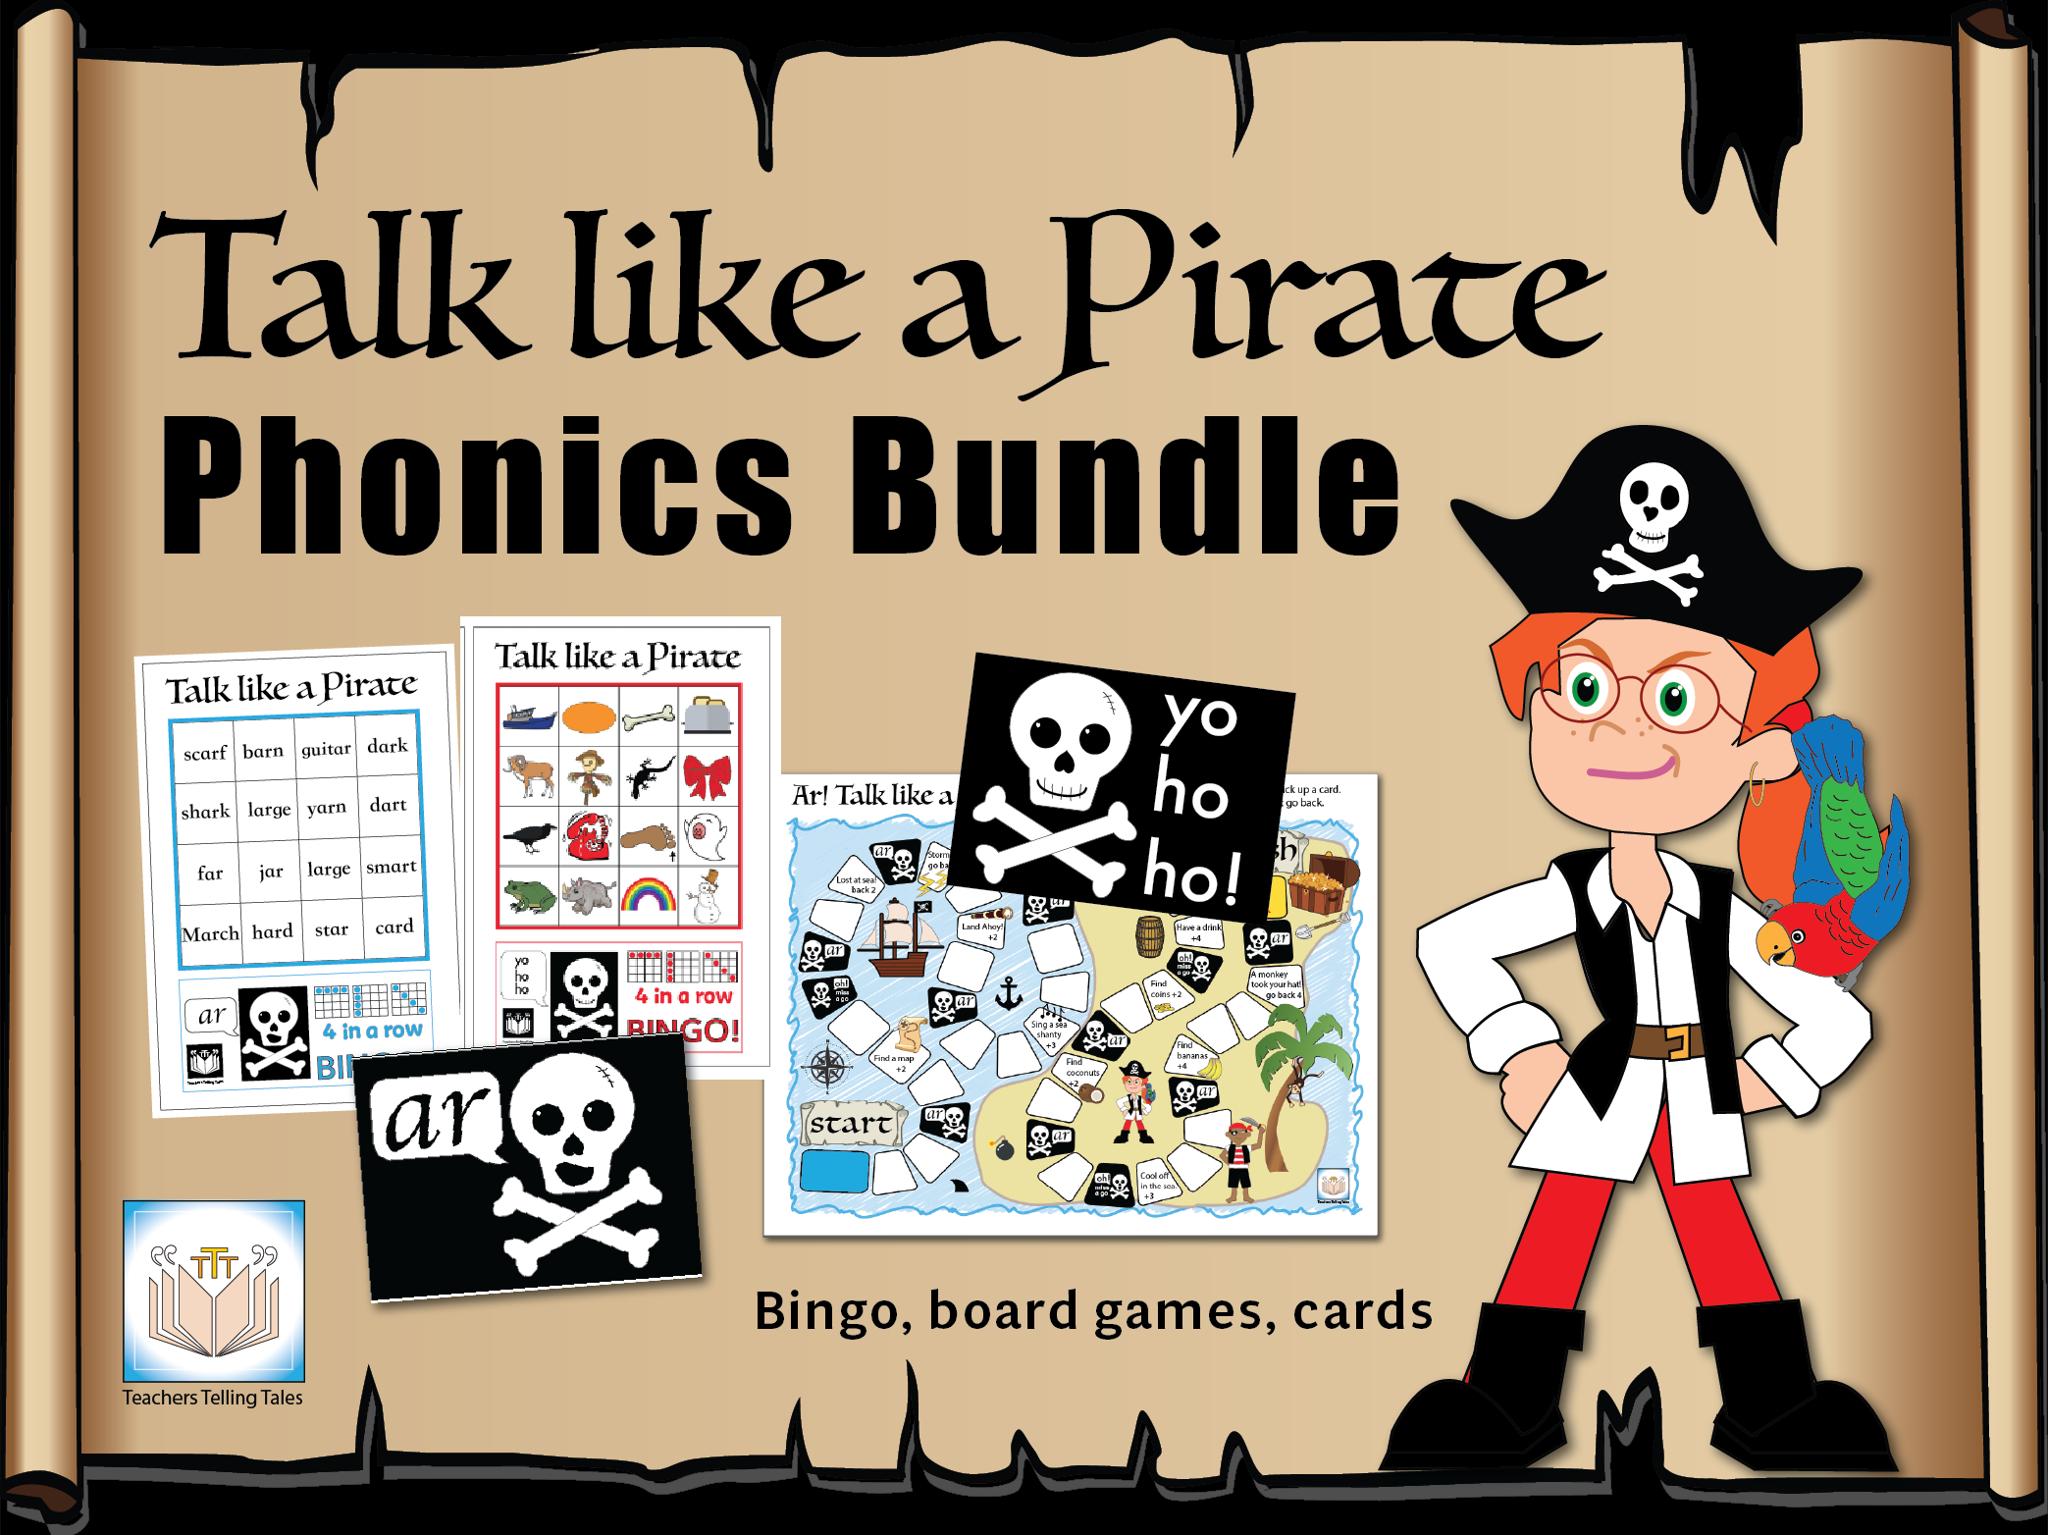 Talk like a Pirate Phonics Bundle